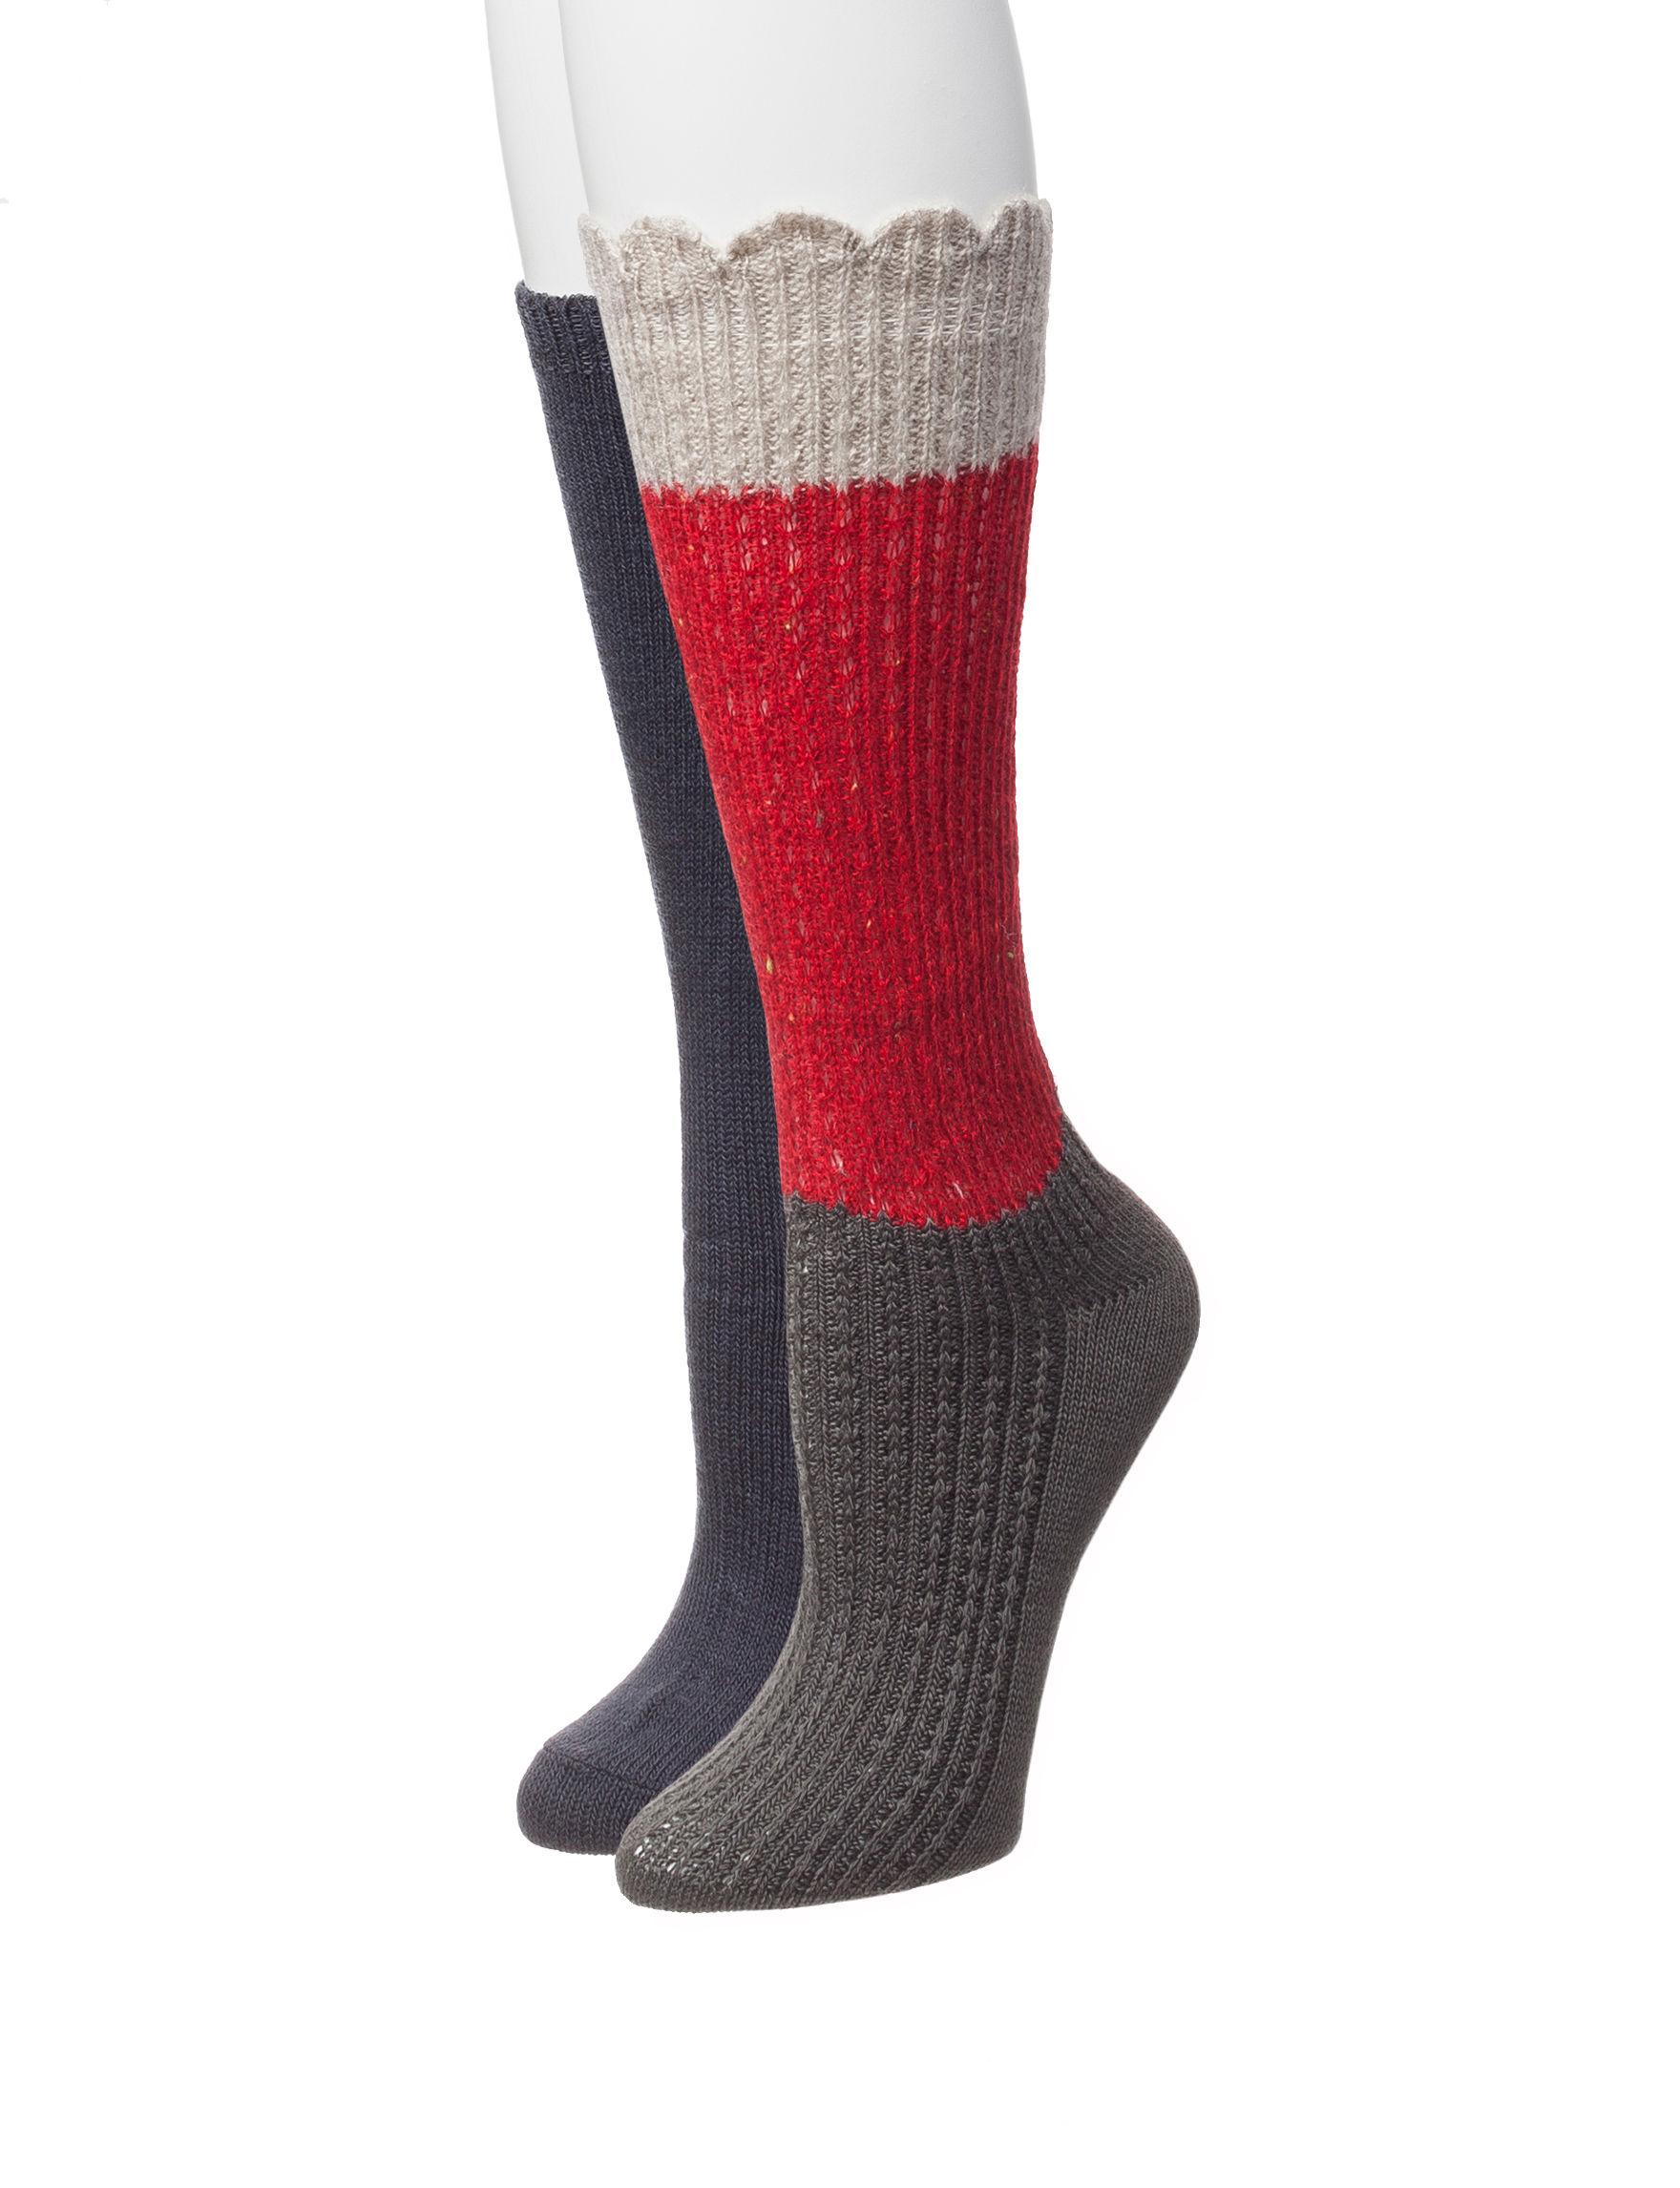 Signature Studio Red Socks